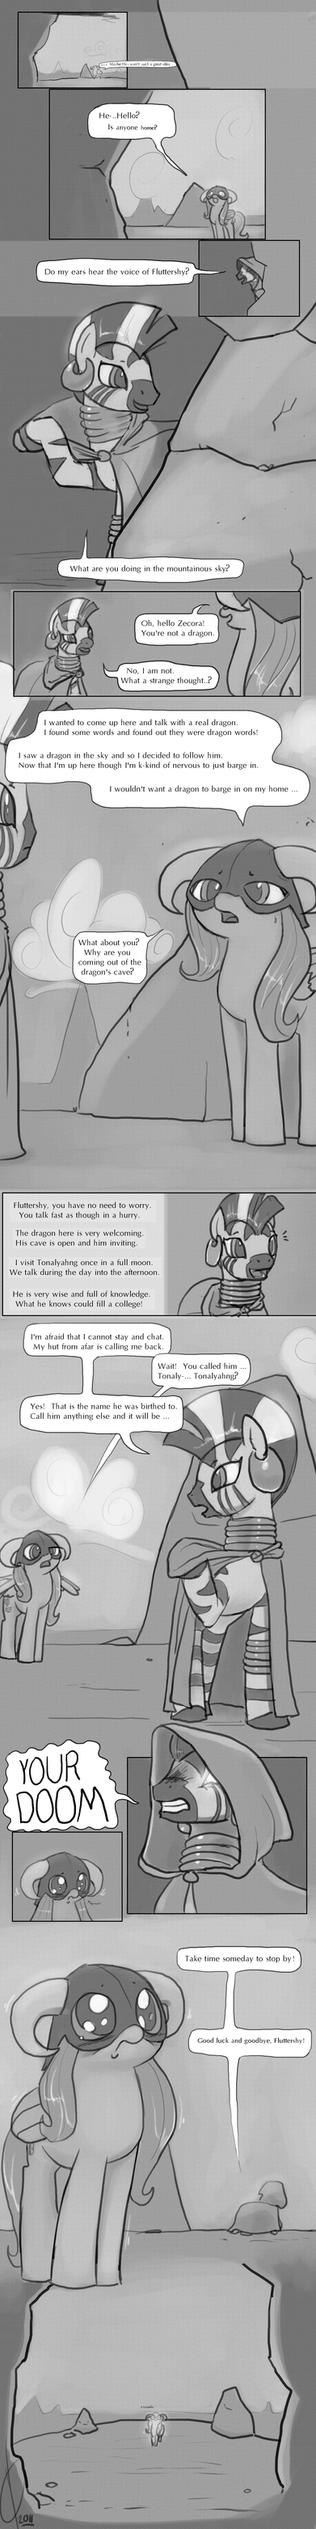 Dragonshy:  A trying, rhyming time. by Dreatos